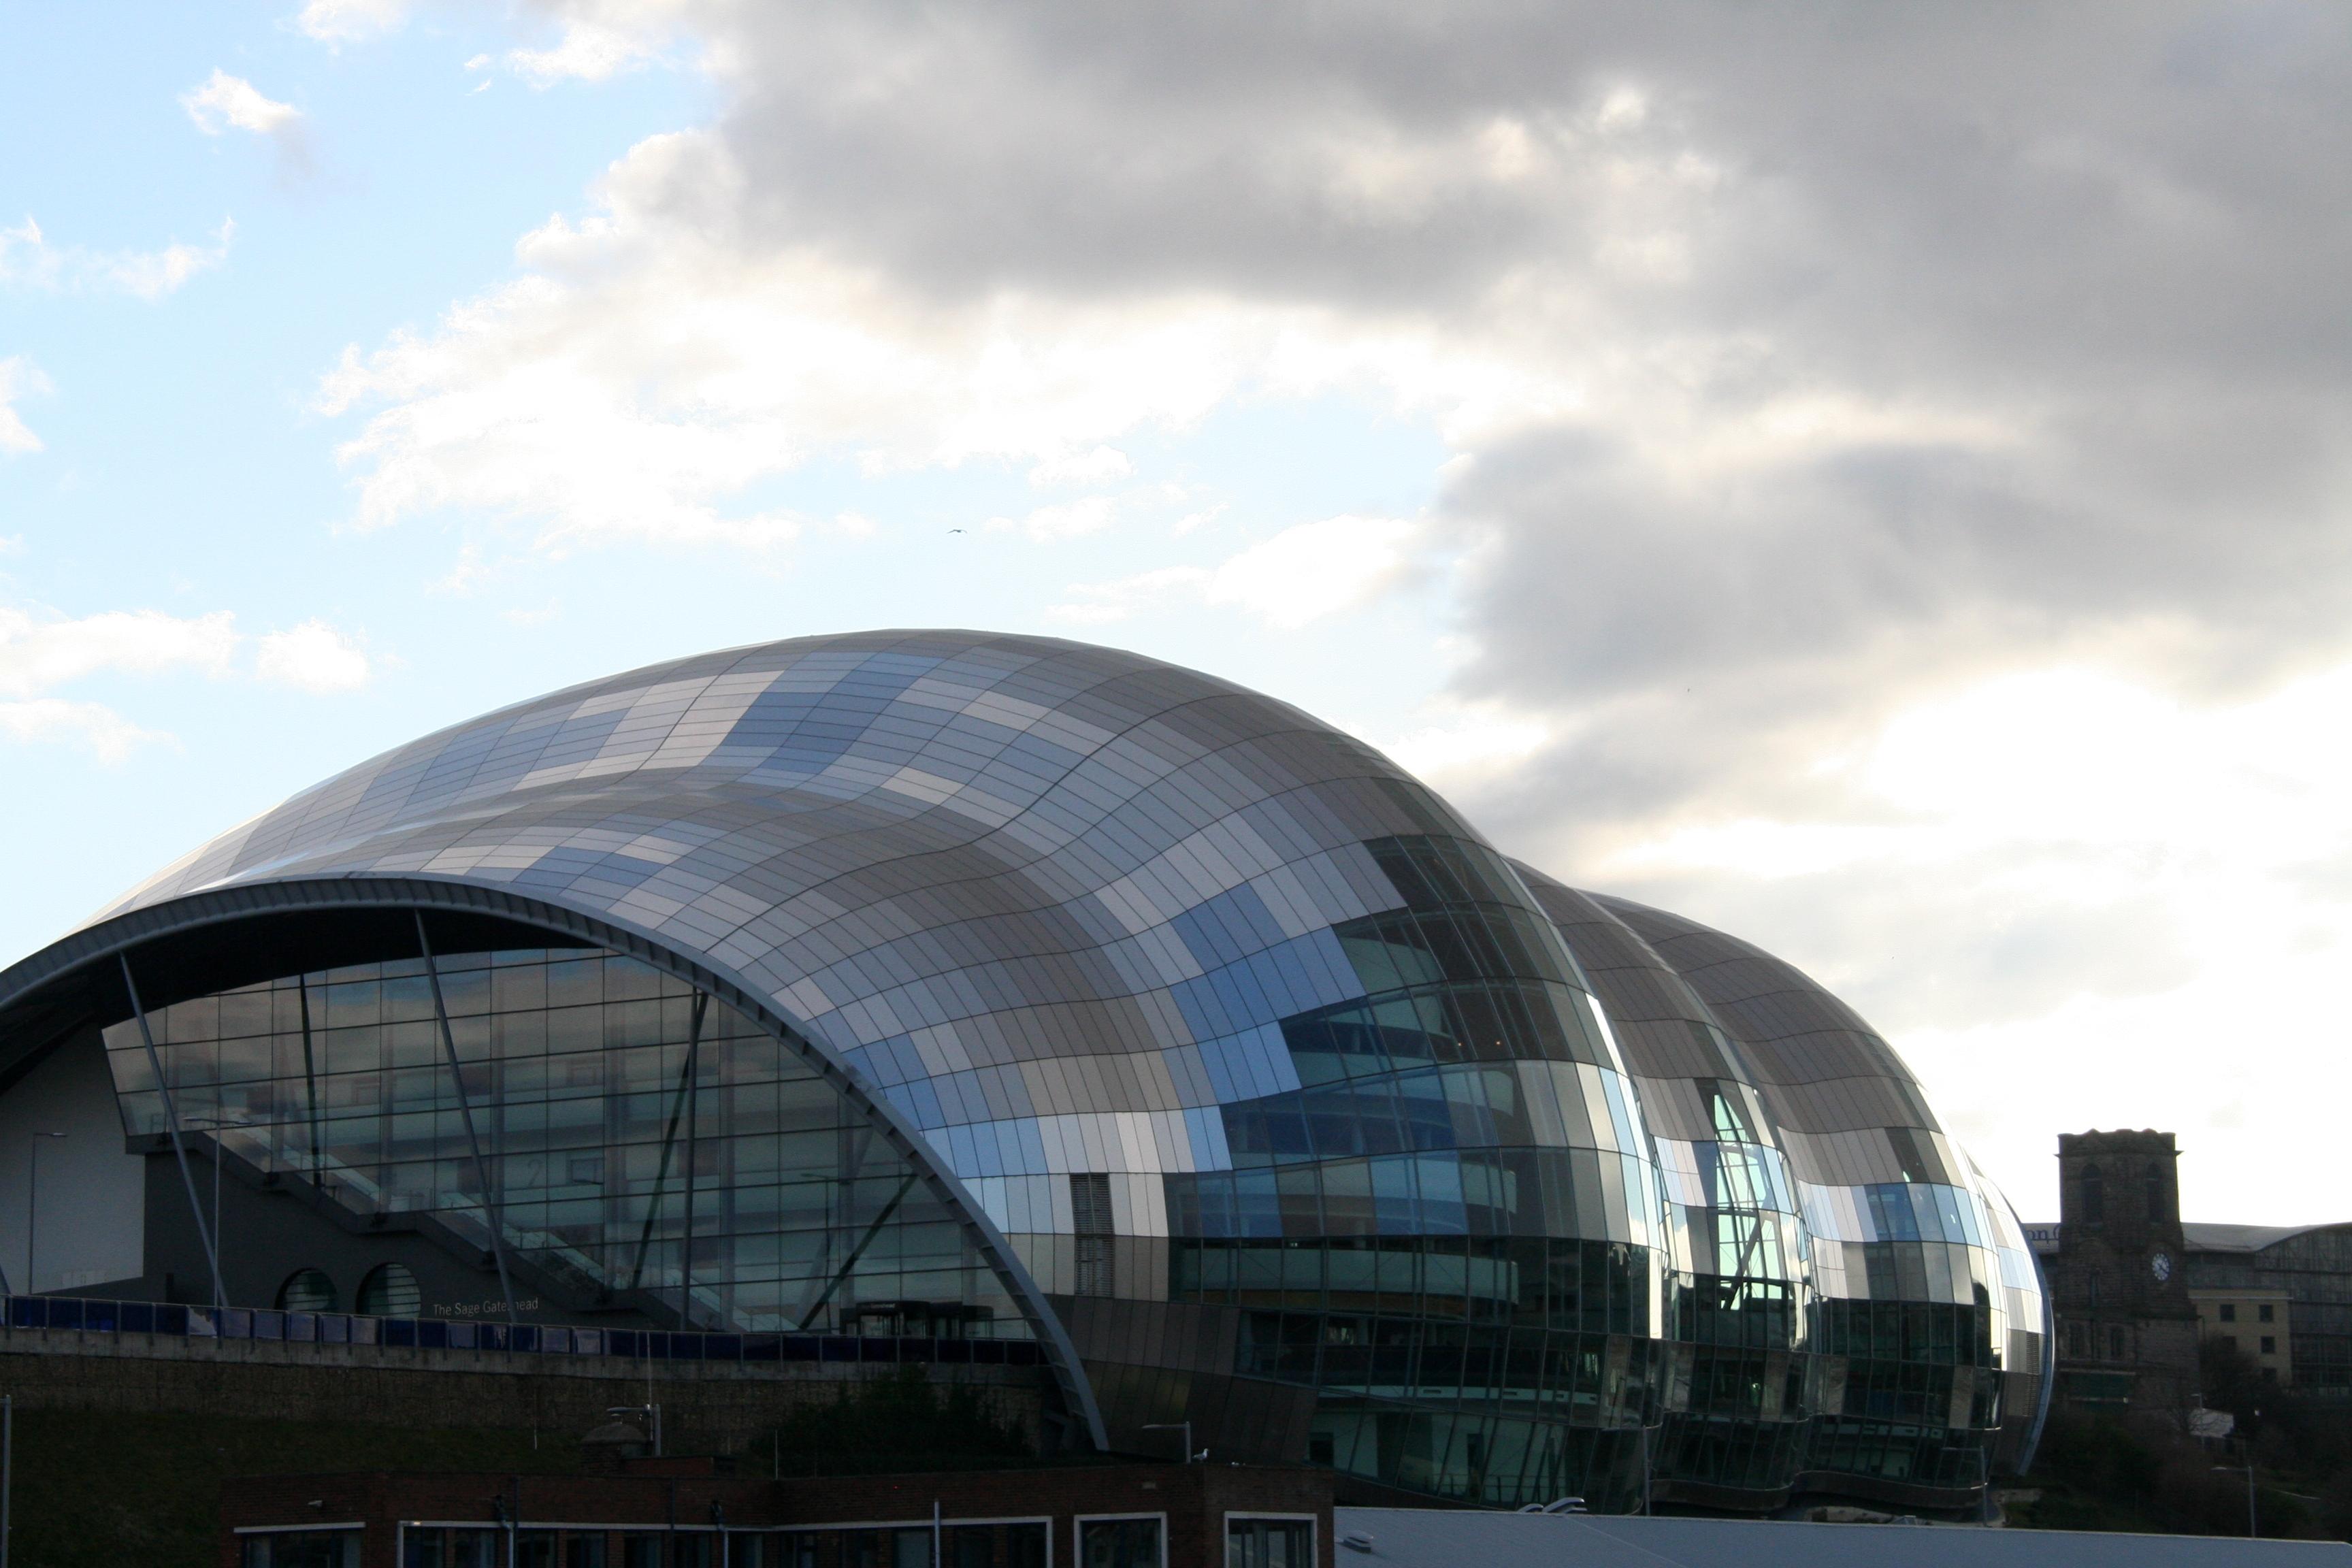 Curvy Gateshead – Travel with Intent